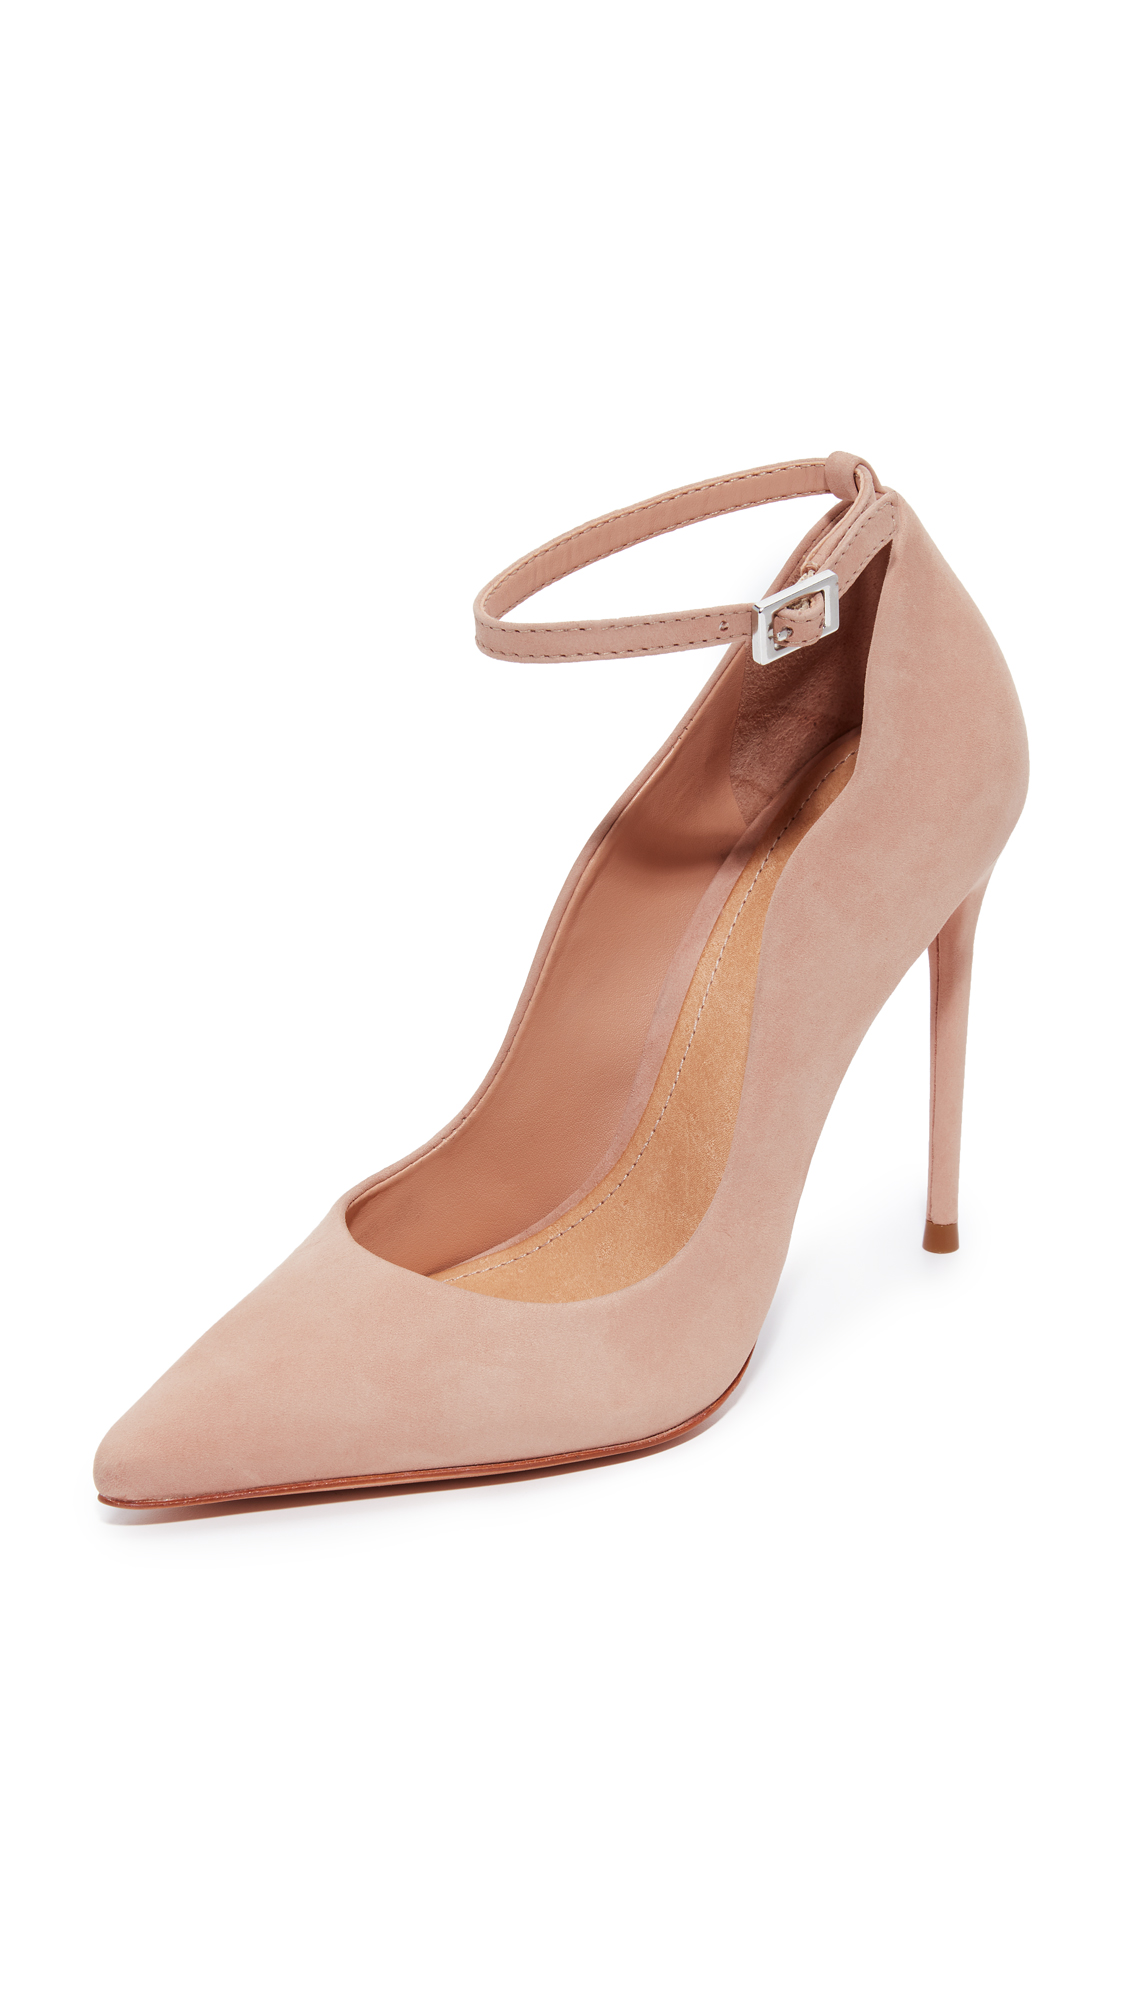 Schutz Thaynara Ankle Strap Pointed Heels - Amendoa